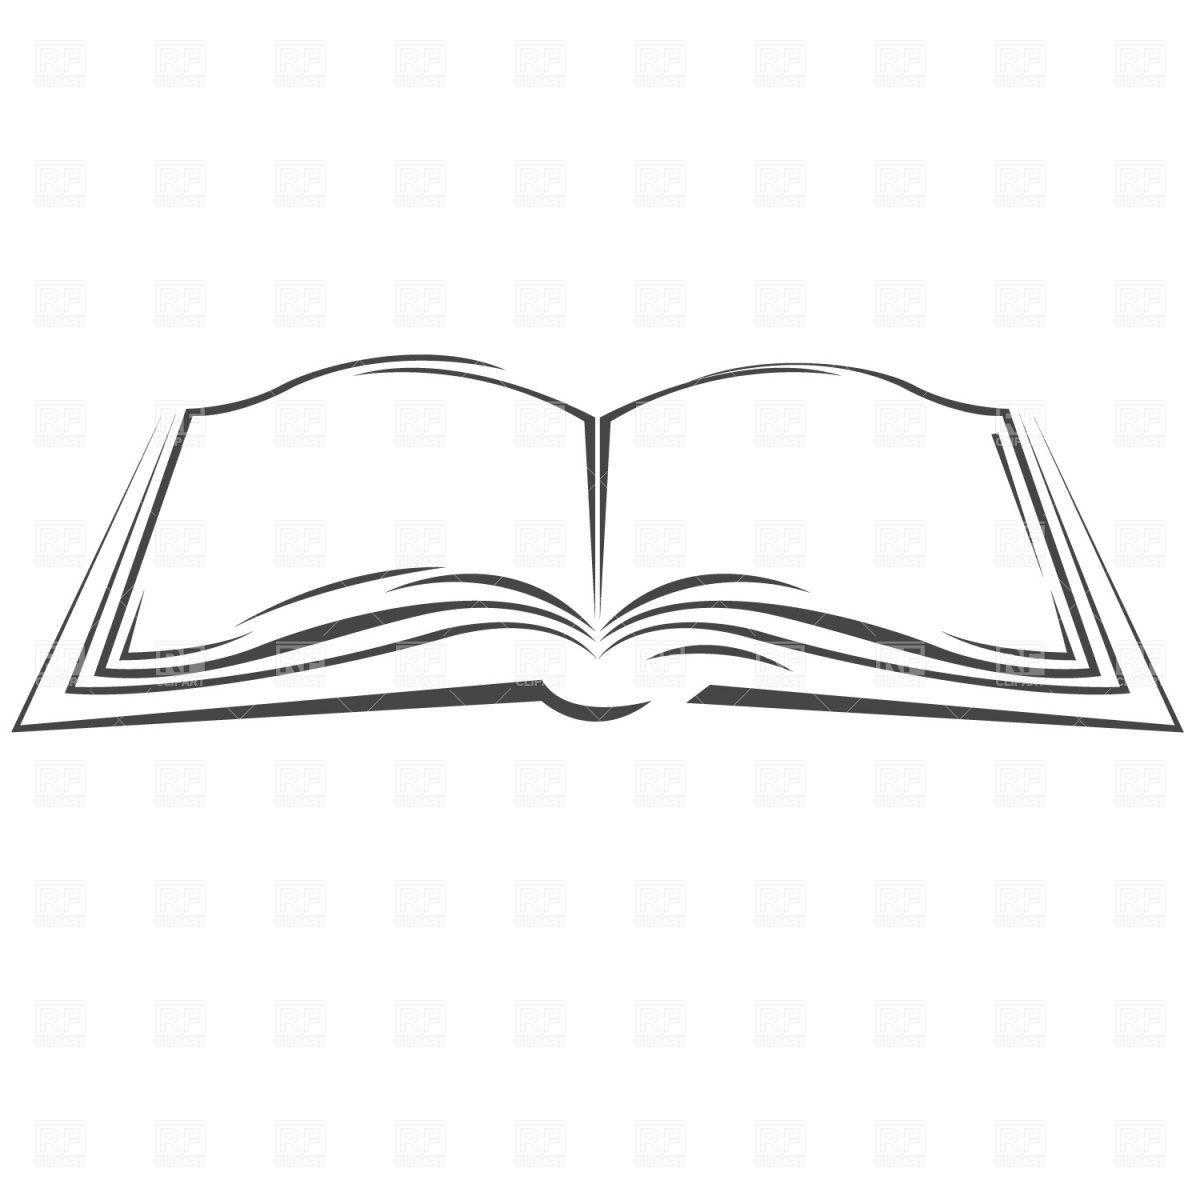 Images clip art symbolic. Bible clipart open book